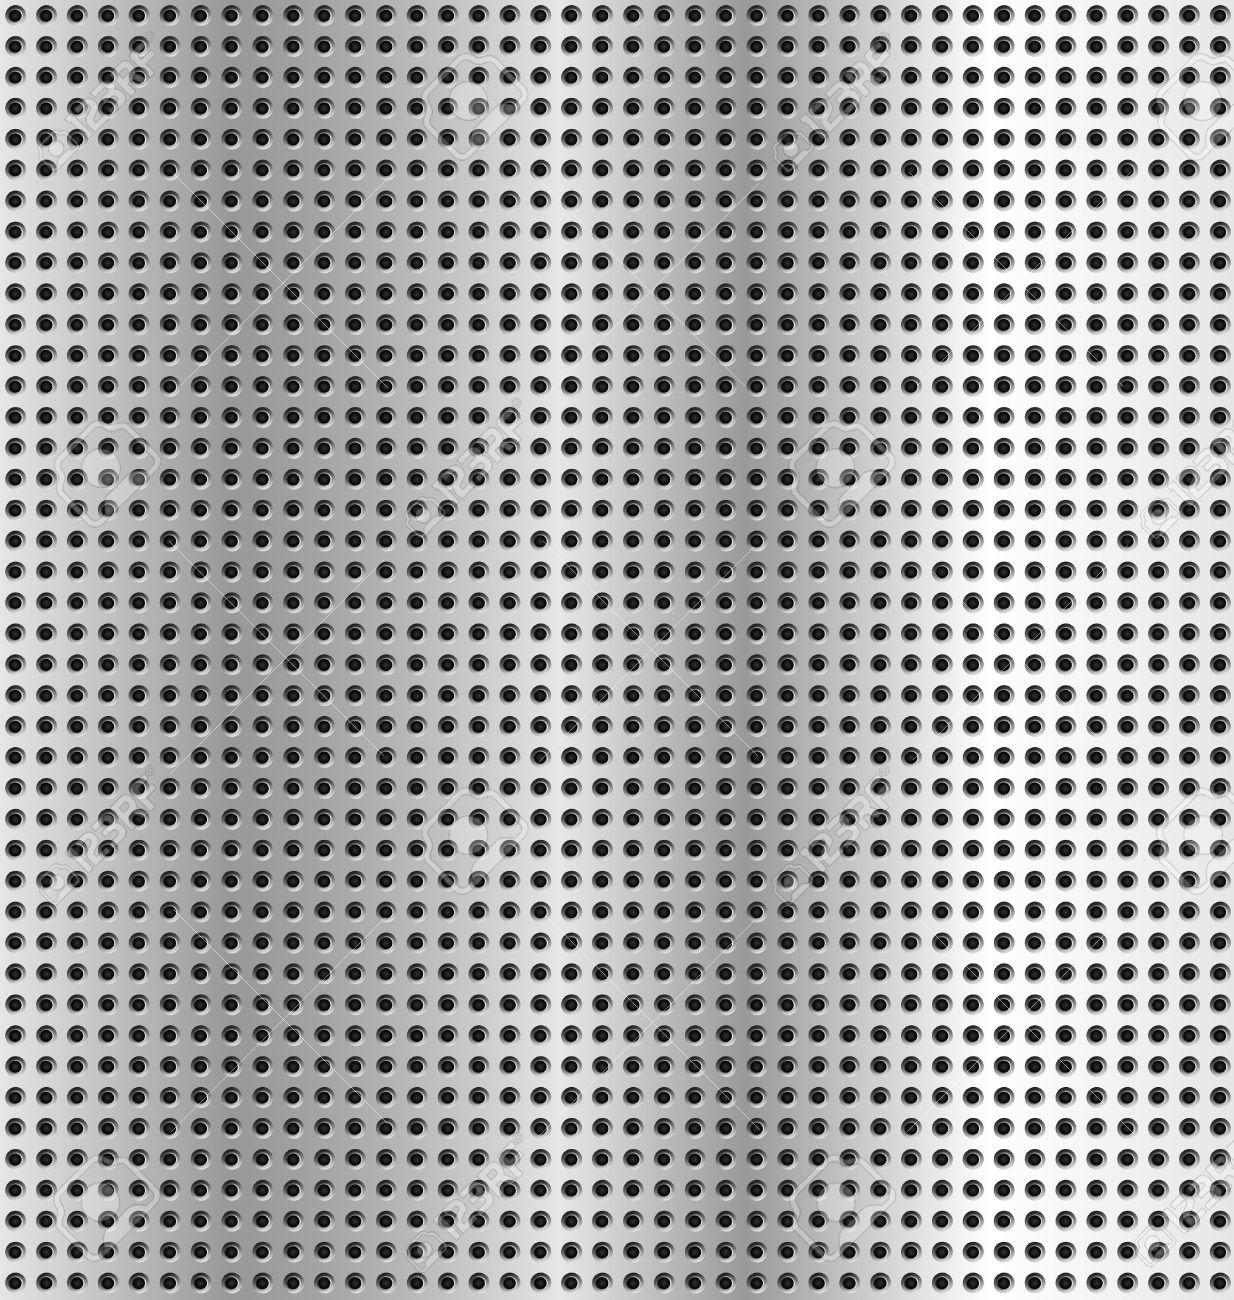 metallic background - texture silver metal holes Stock Vector - 9327520